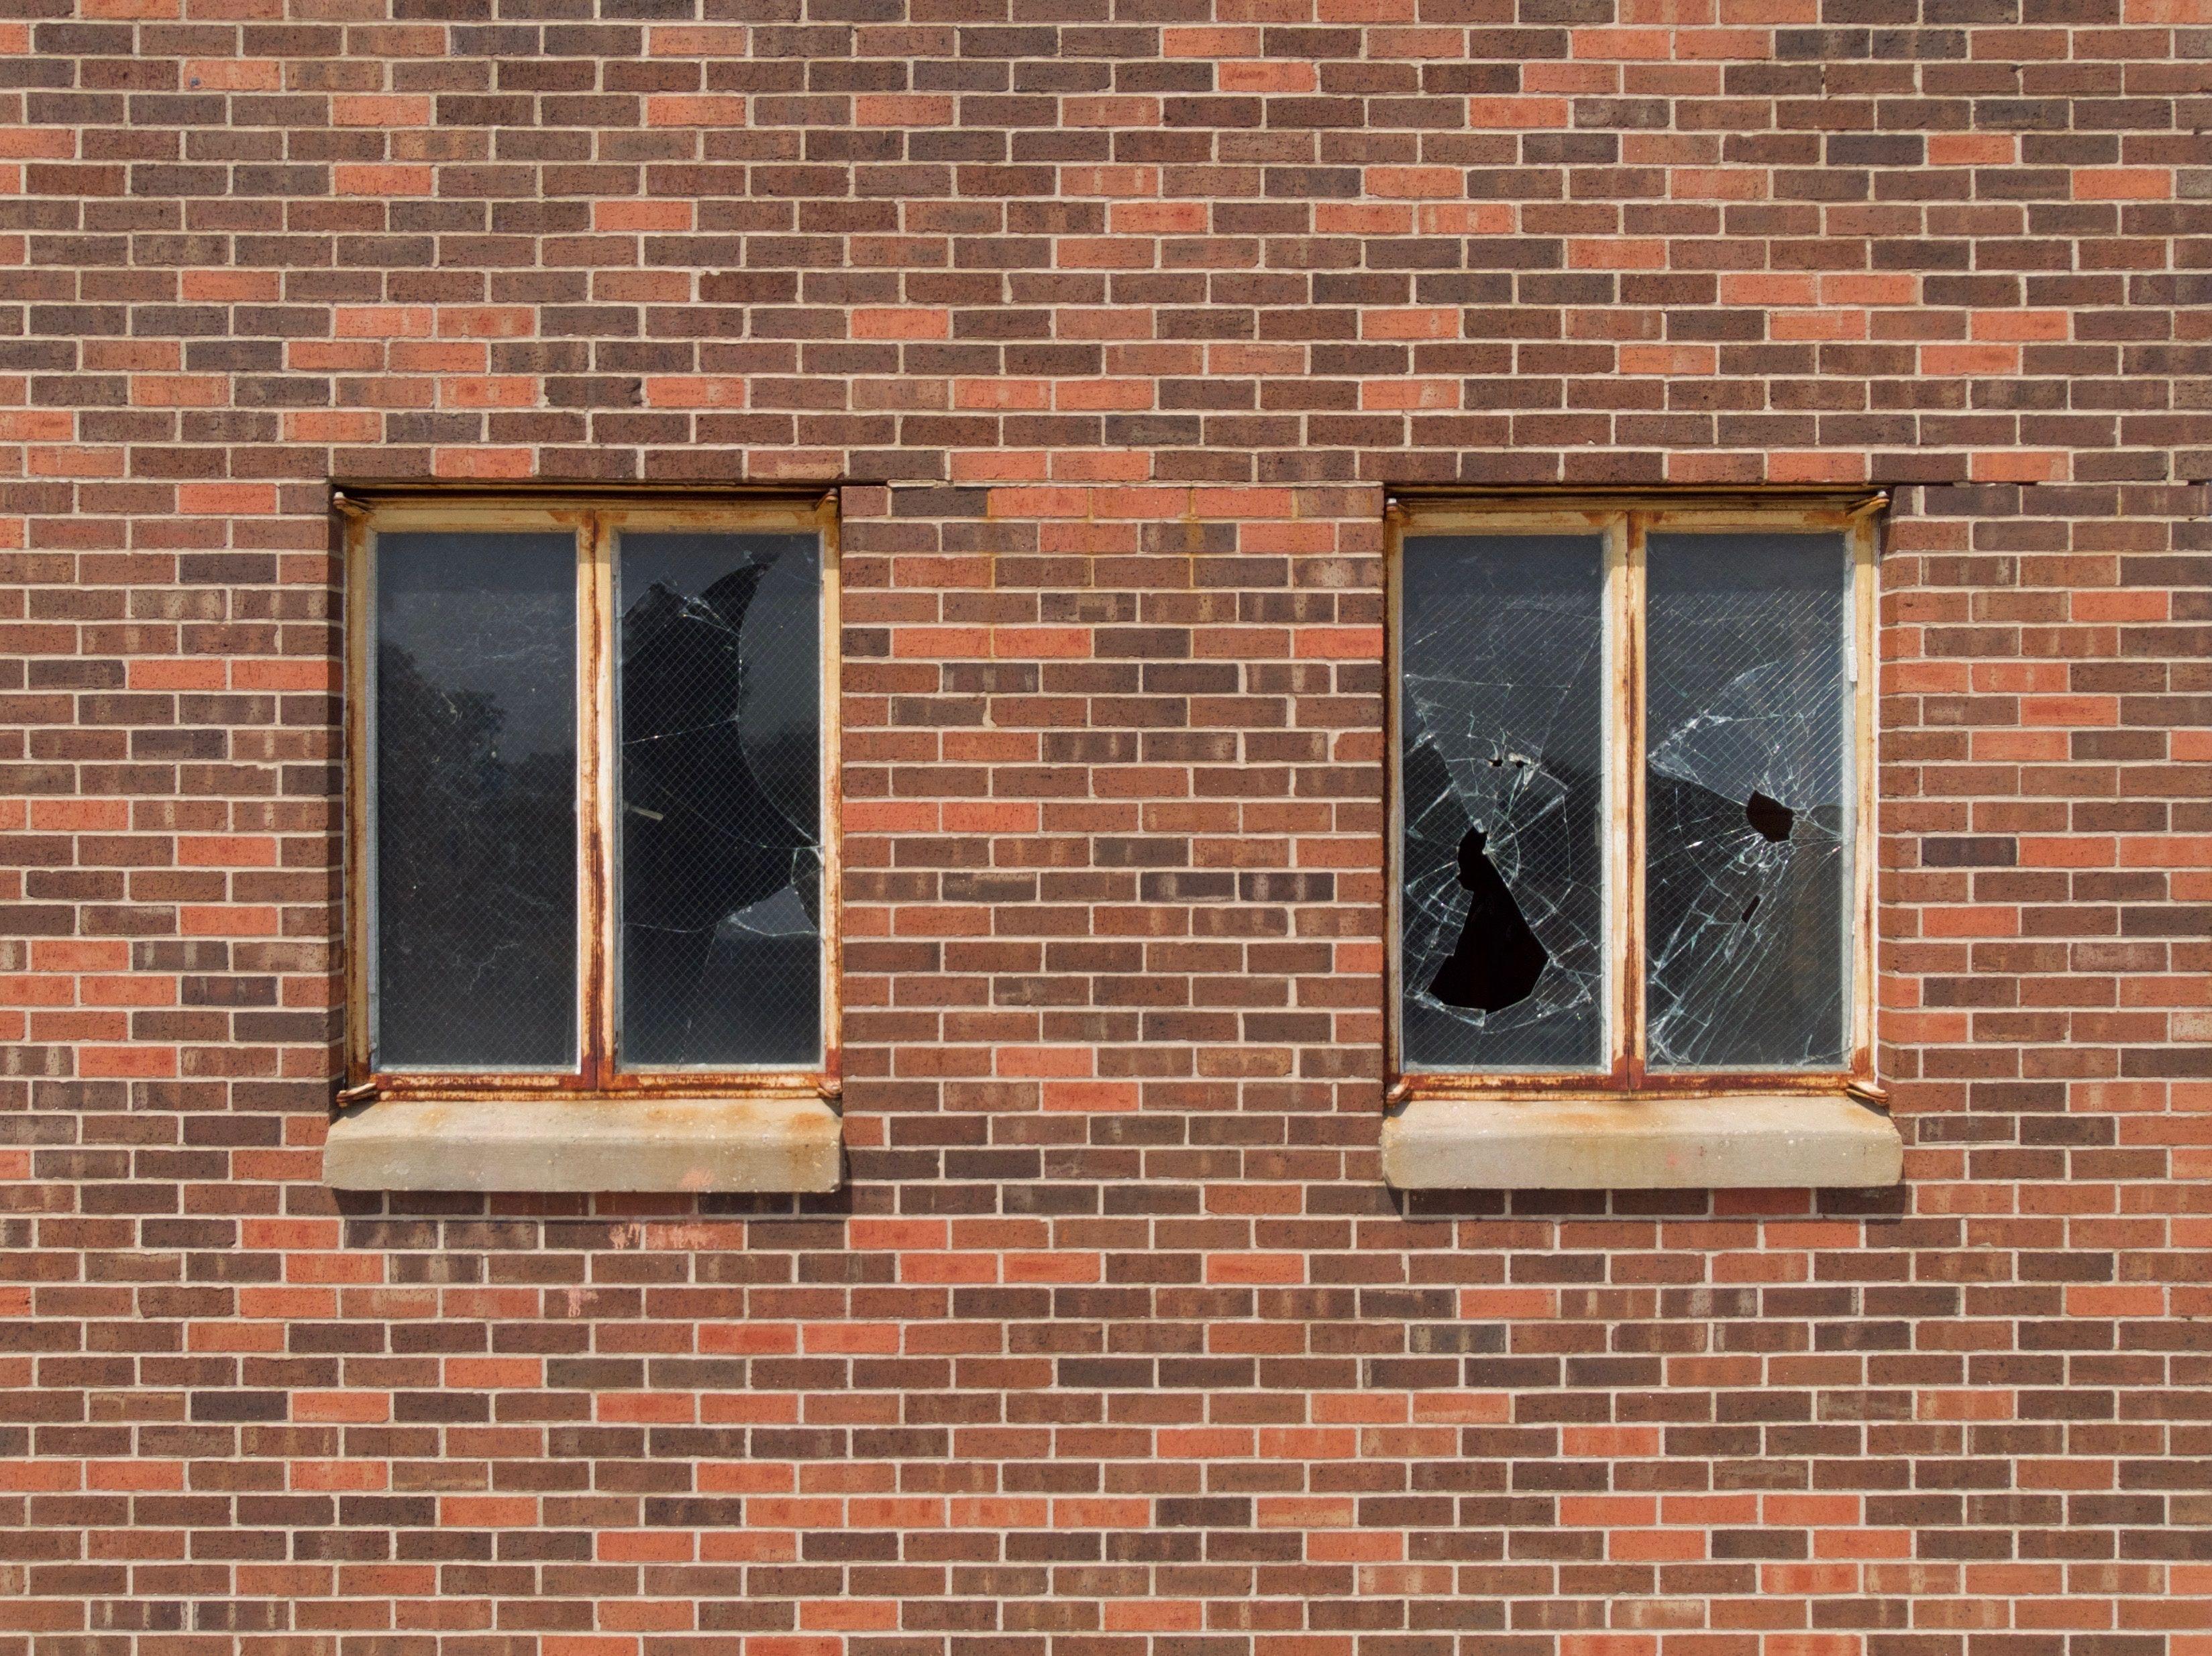 Replace A Broken Window Pane Window Pane Free Textures